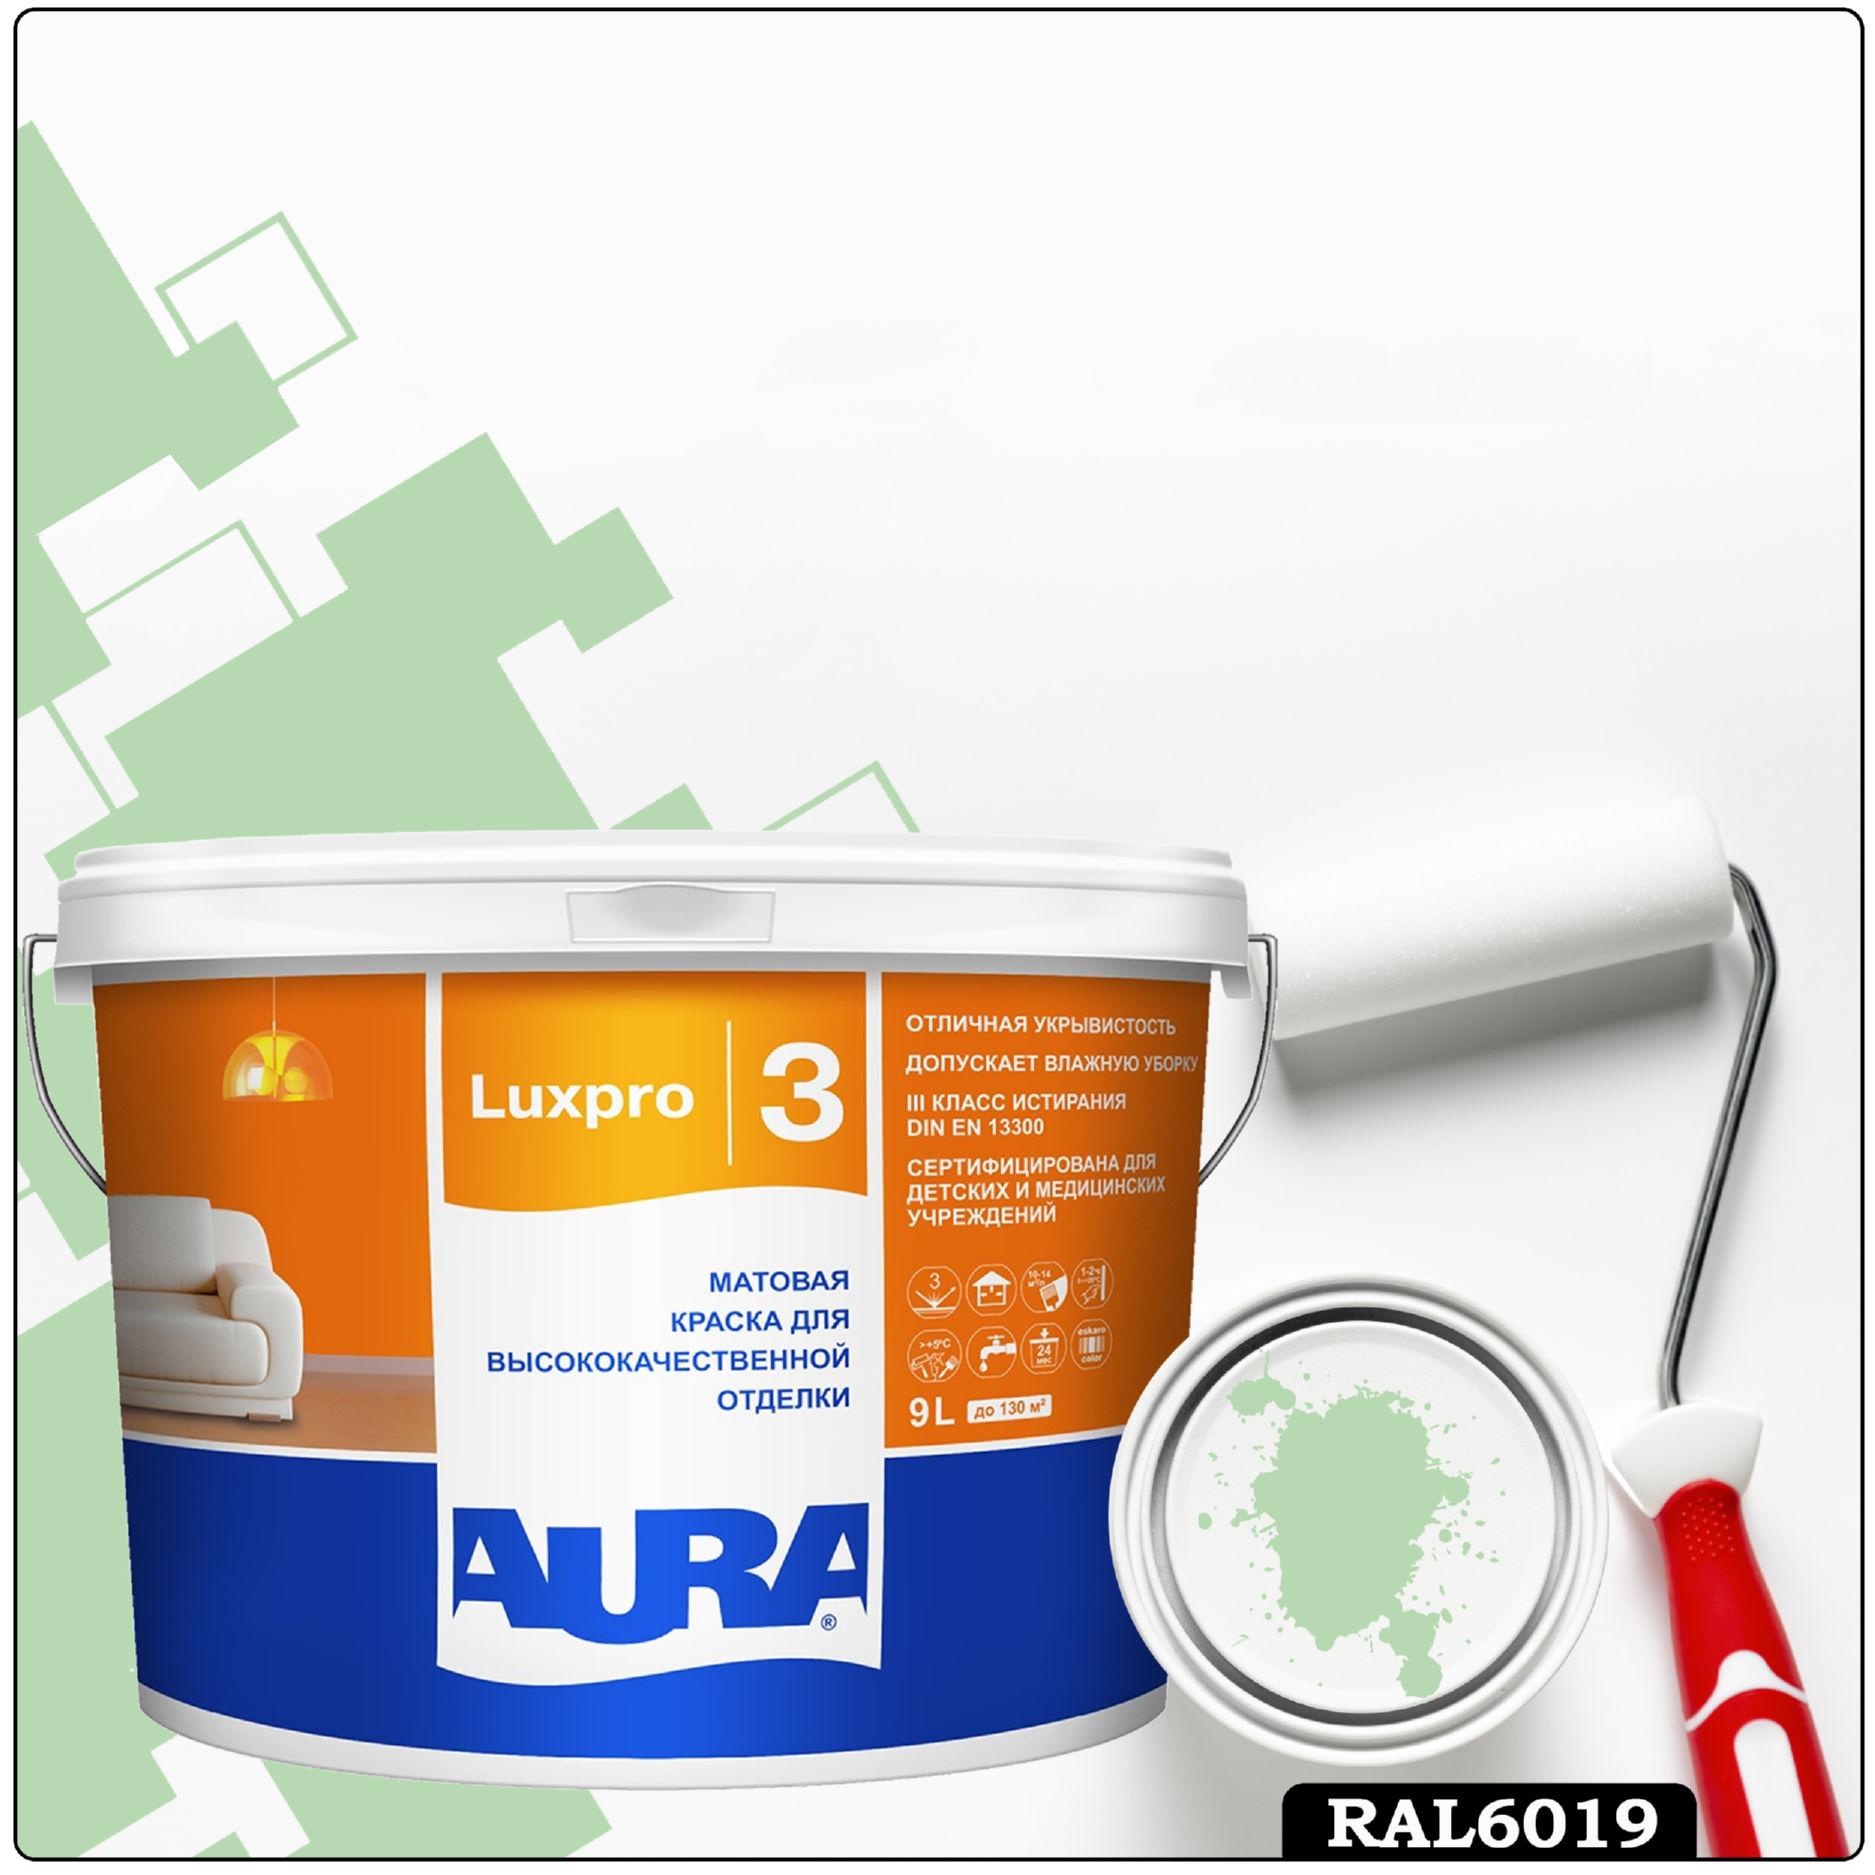 Фото 20 - Краска Aura LuxPRO 3, RAL 6019 Бело-зелёный, латексная, шелково-матовая, интерьерная, 9л, Аура.